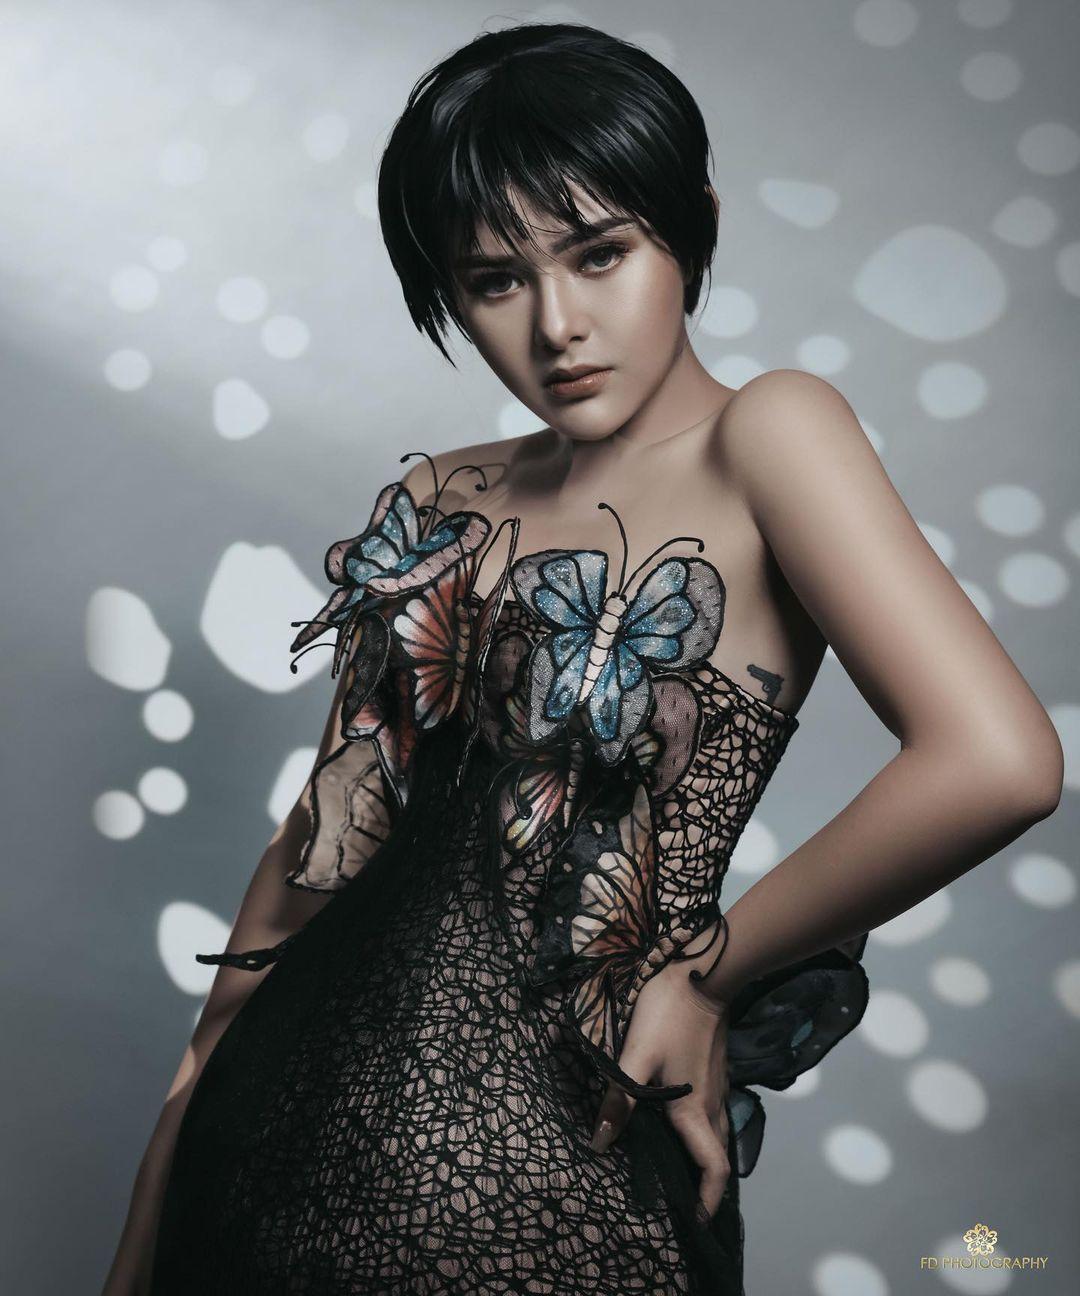 5 Potret cantik dan menawan Amanda Manopo, bak model